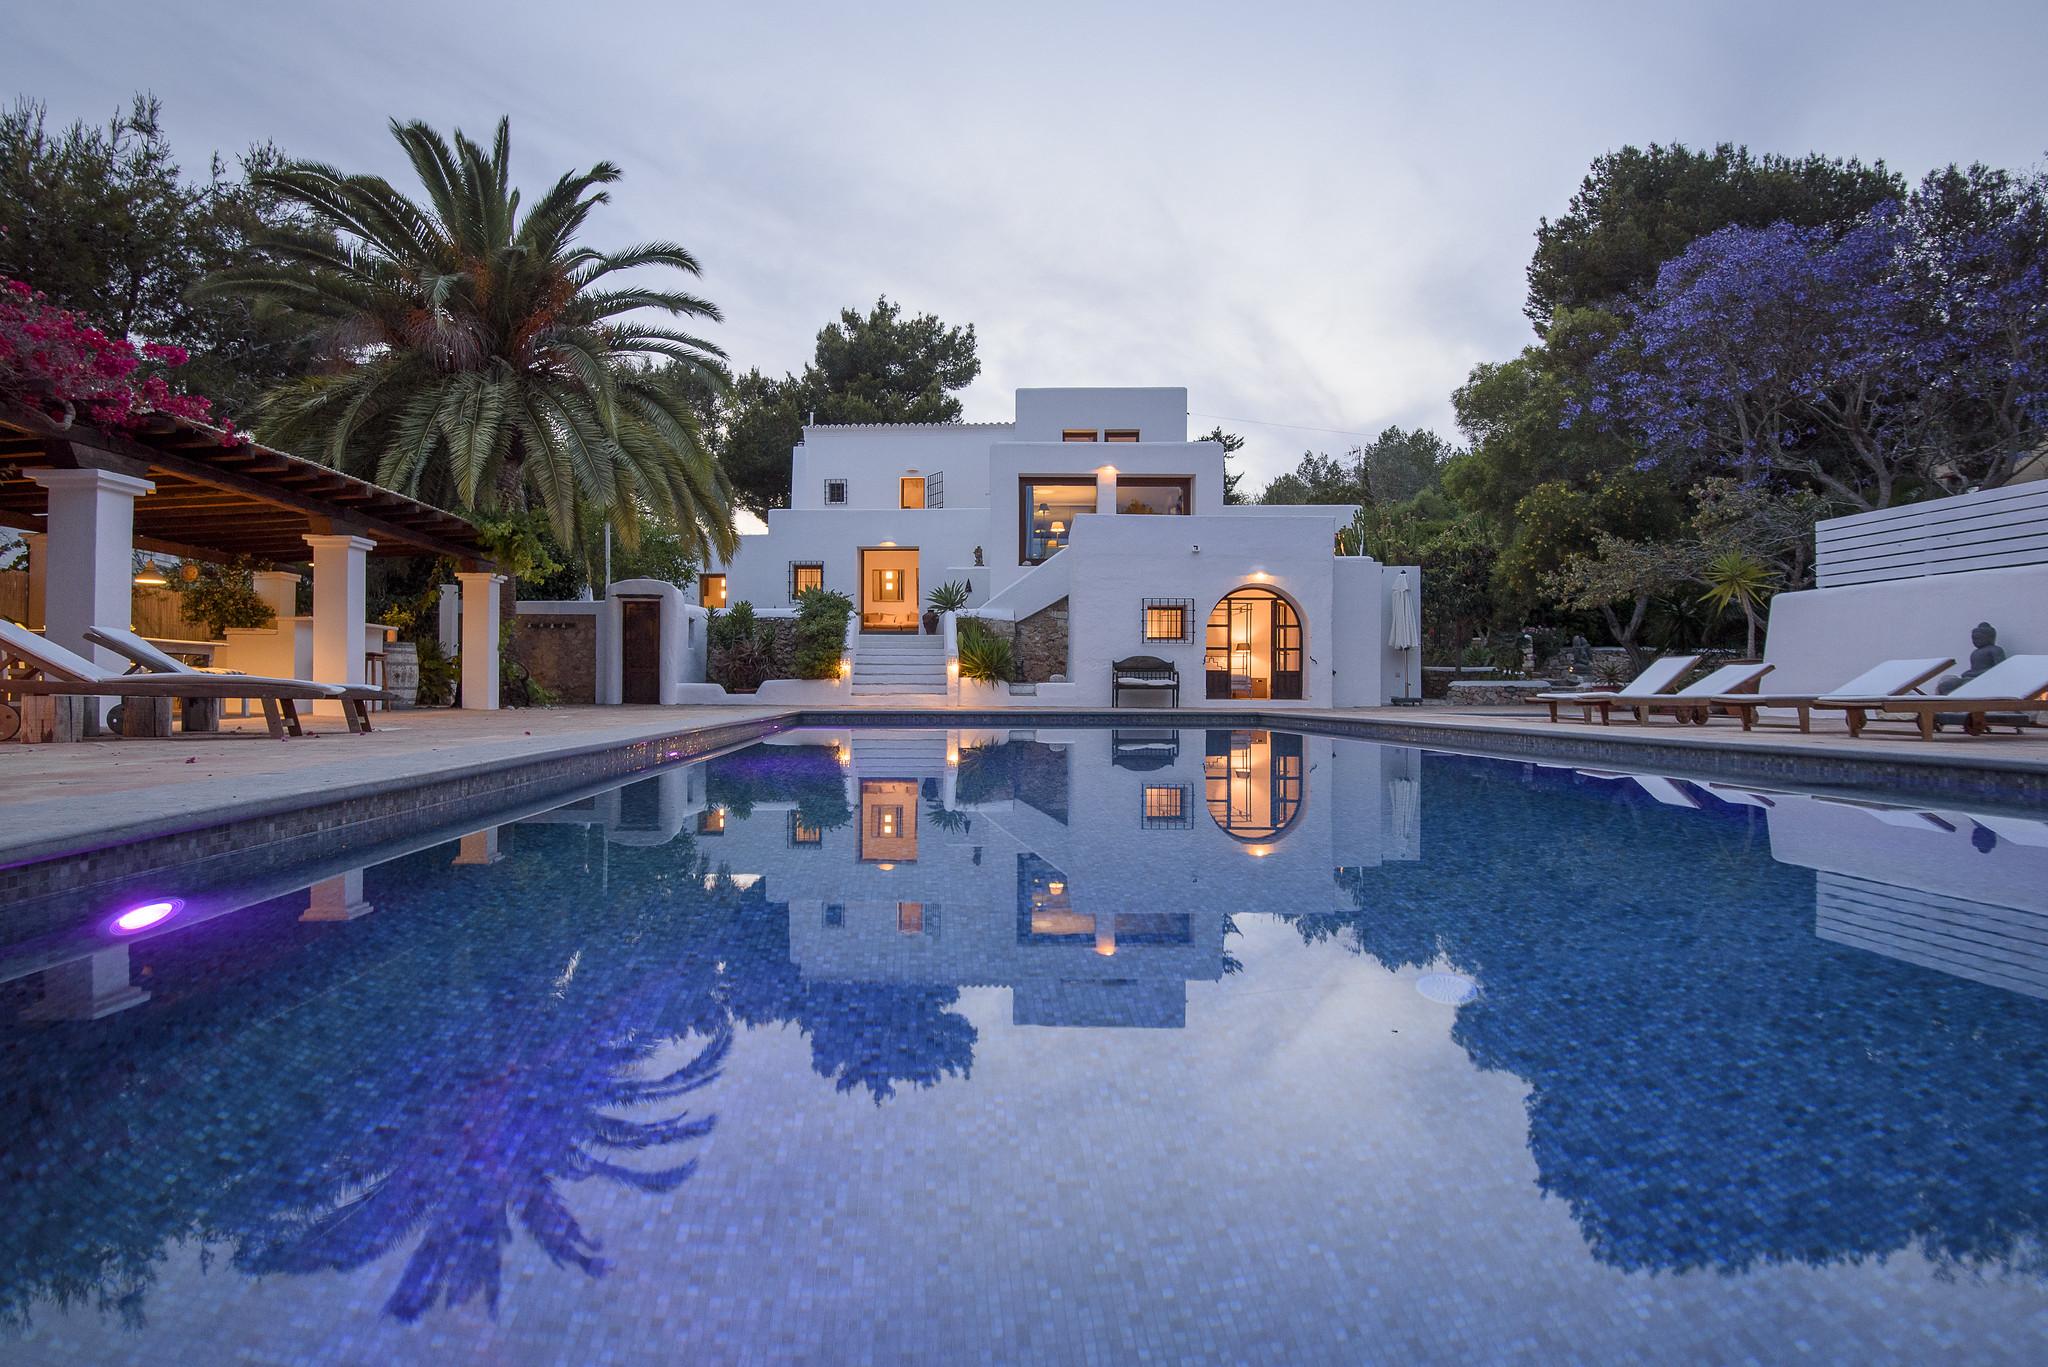 https://www.white-ibiza.com/wp-content/uploads/2020/05/white-ibiza-villas-can-lyra-evening.jpg